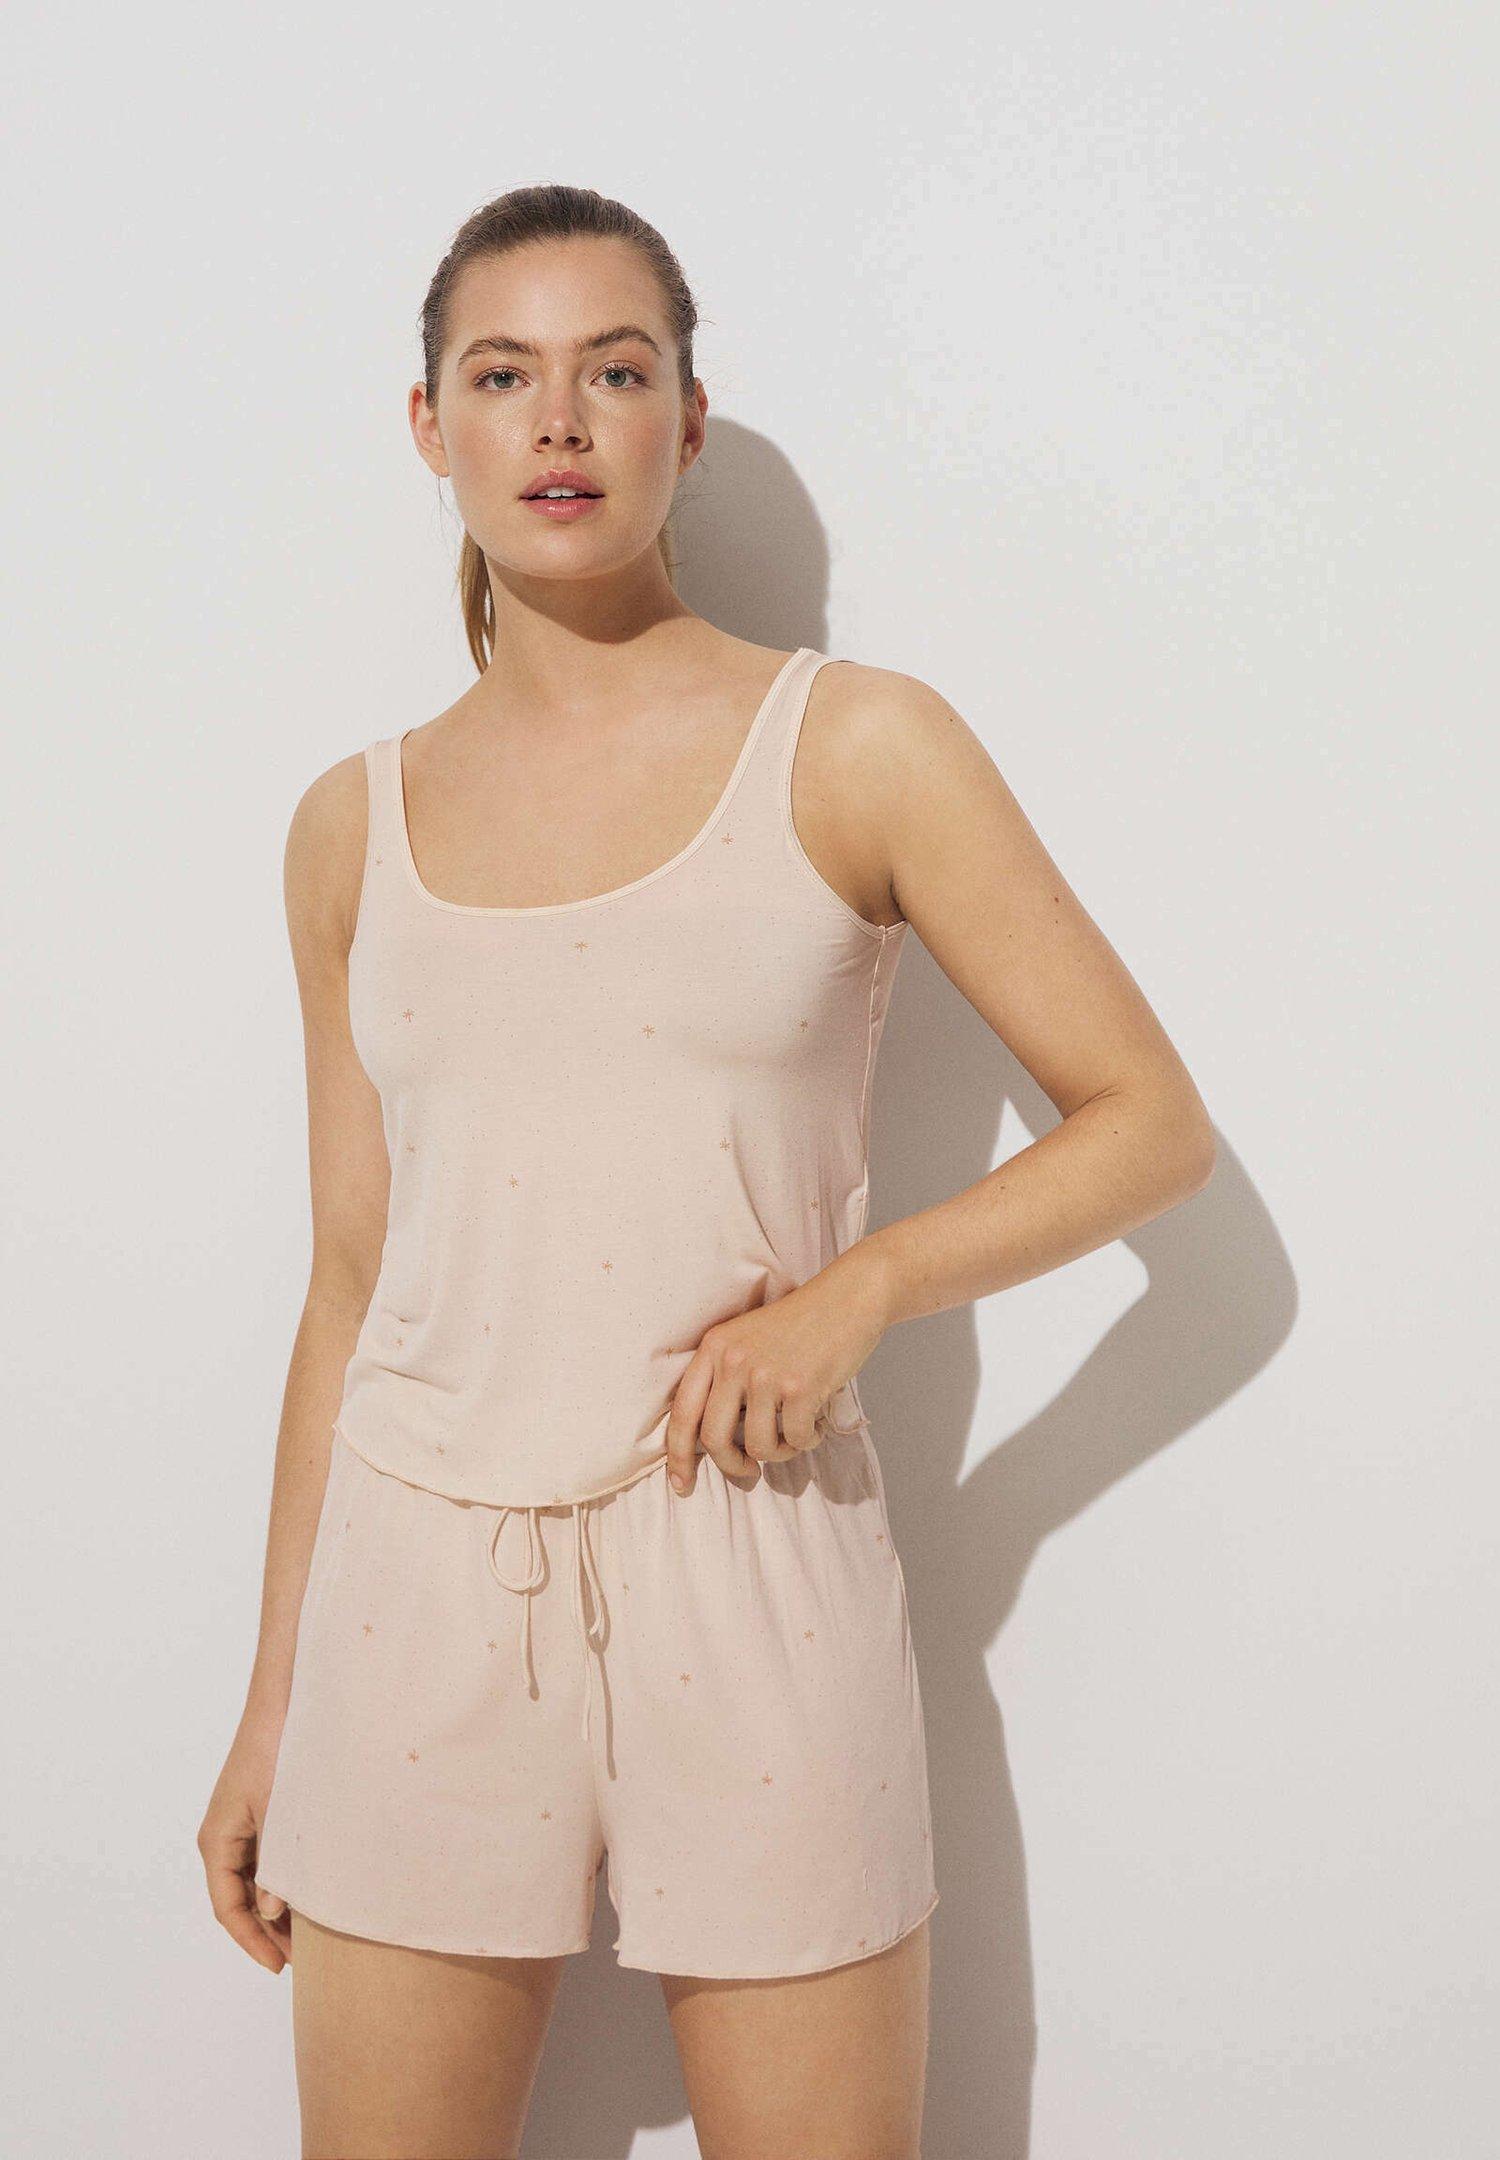 Damen PALM - Nachtwäsche Shirt